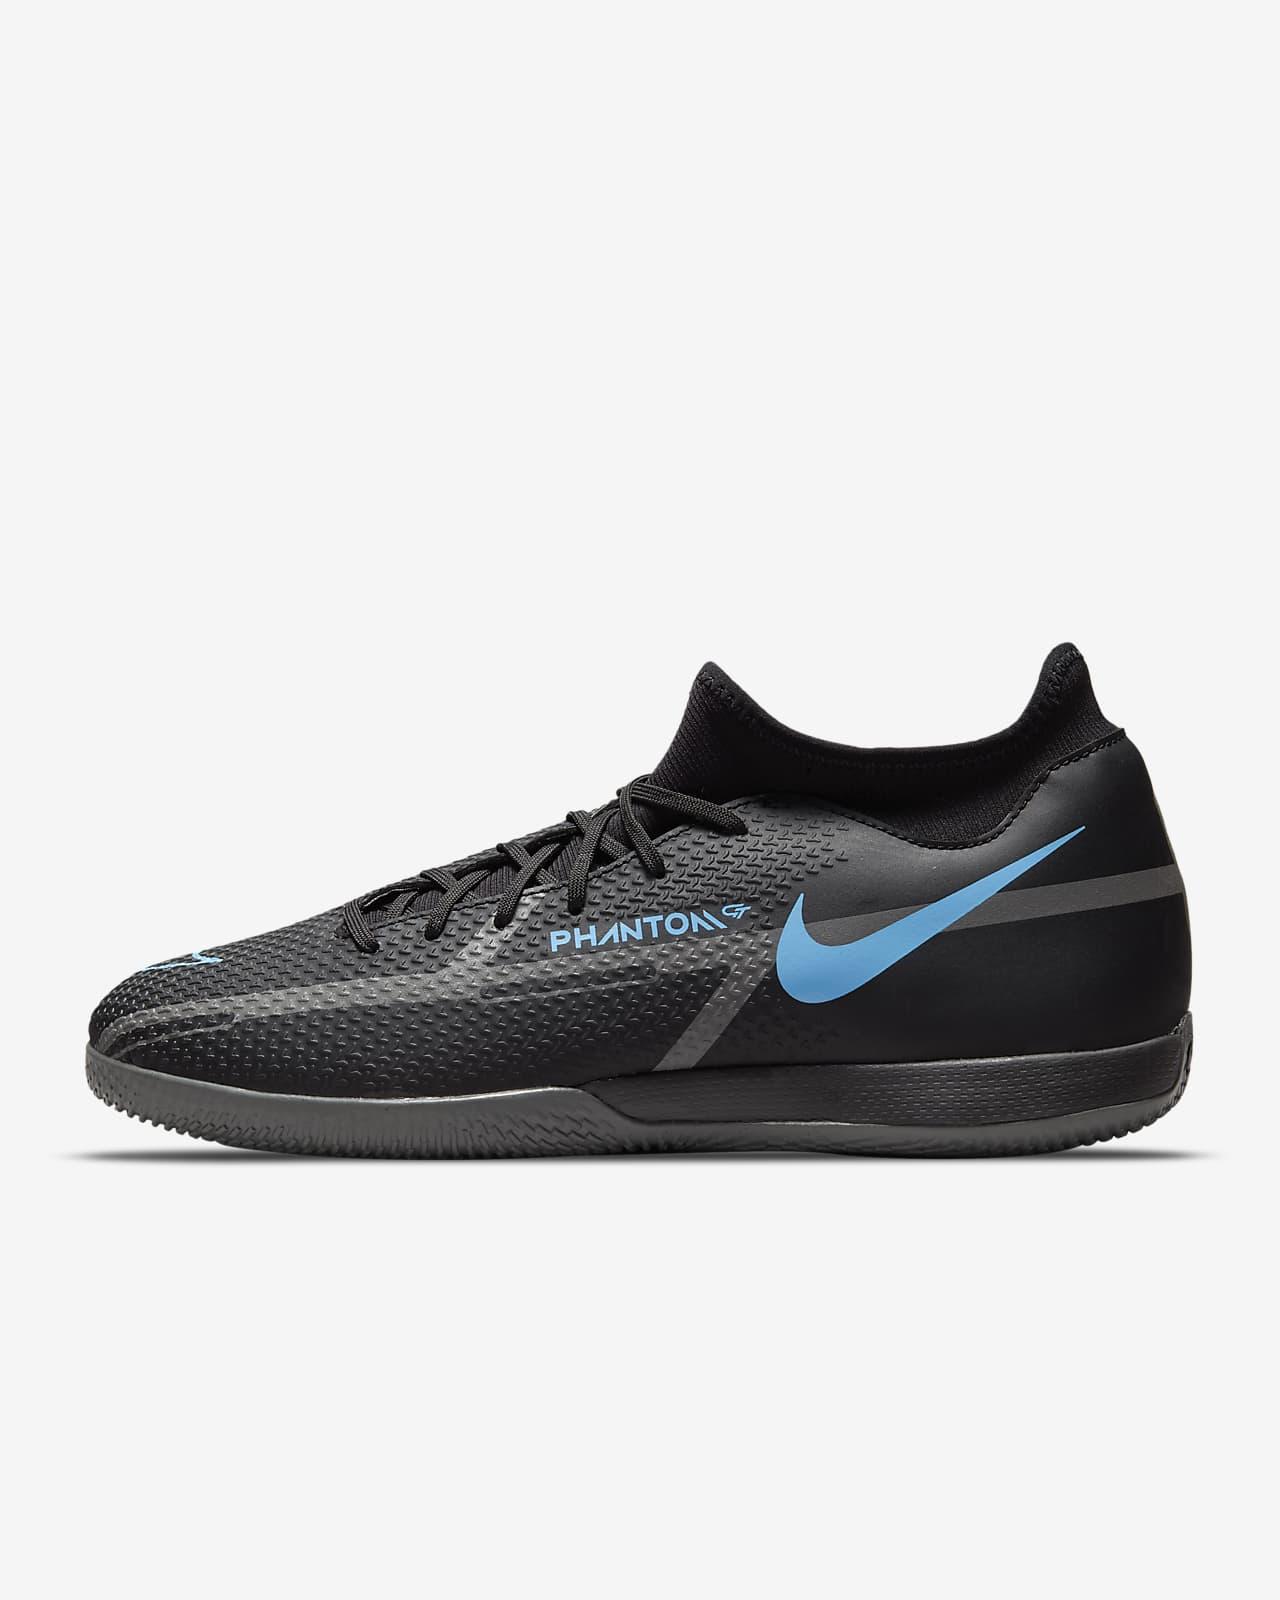 Calzado de fútbol para cancha cubierta Nike Phantom GT2 Academy Dynamic Fit IC